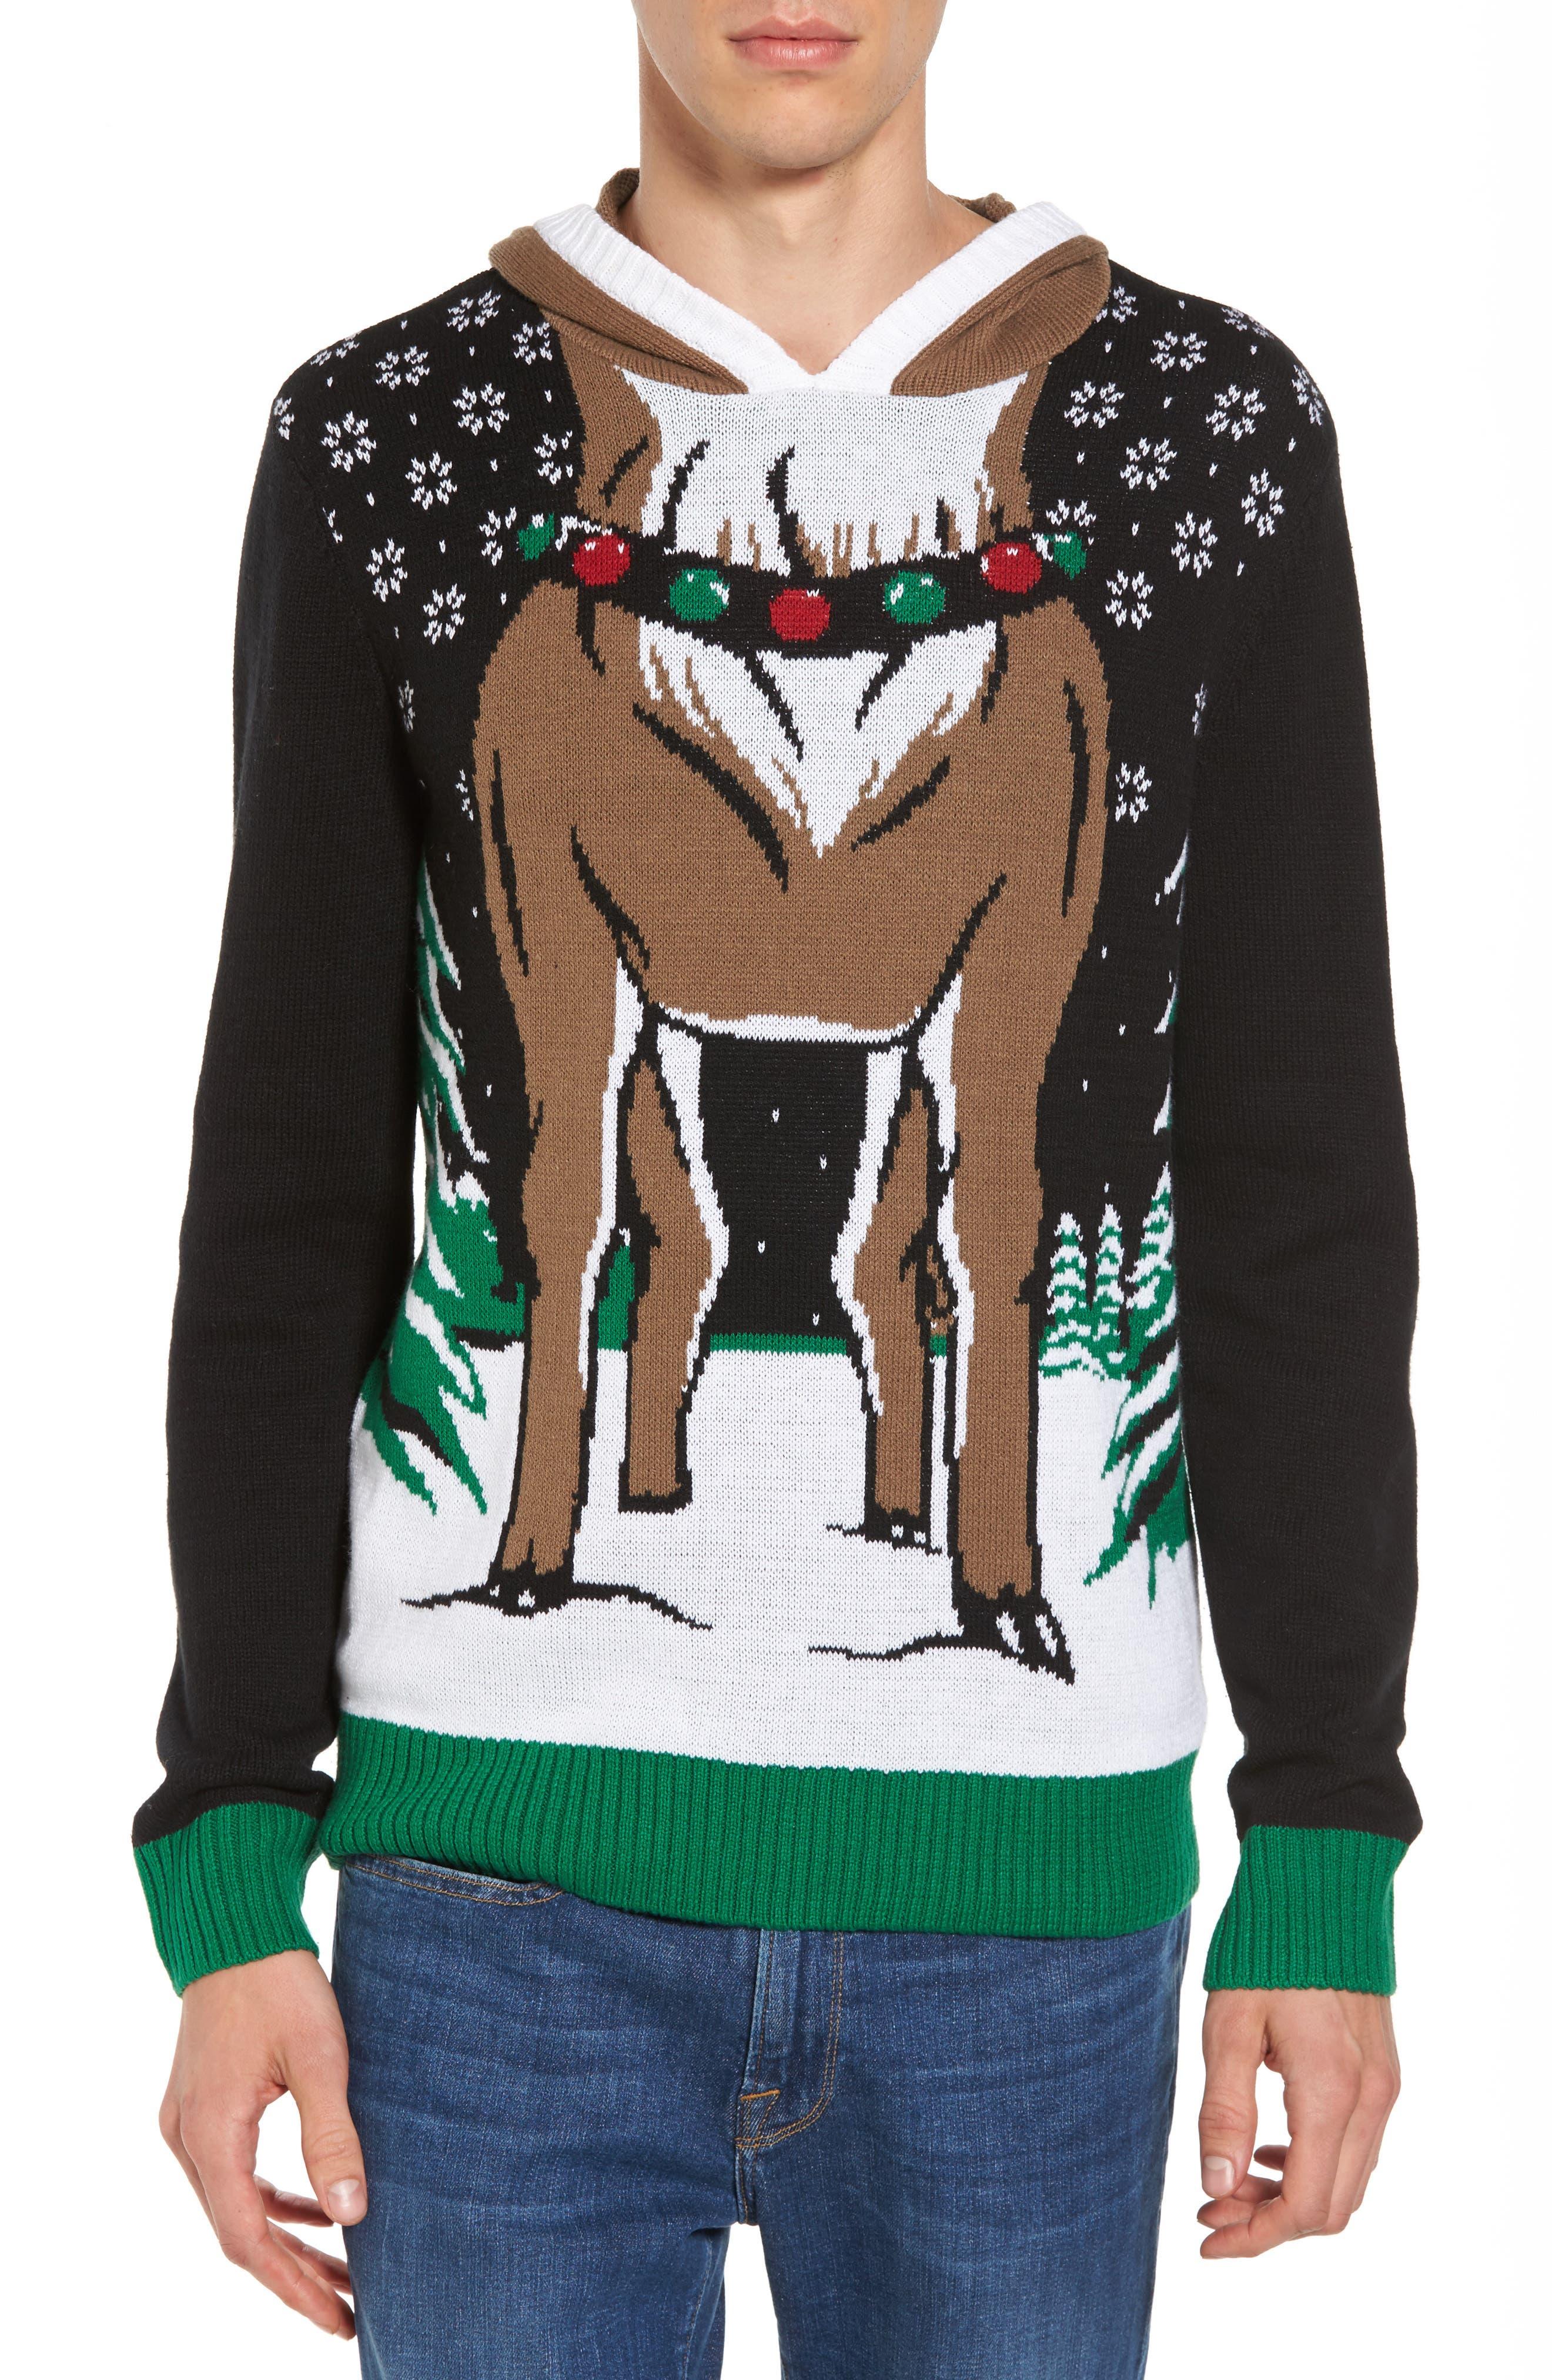 The Rail Reindeer Hooded Sweater